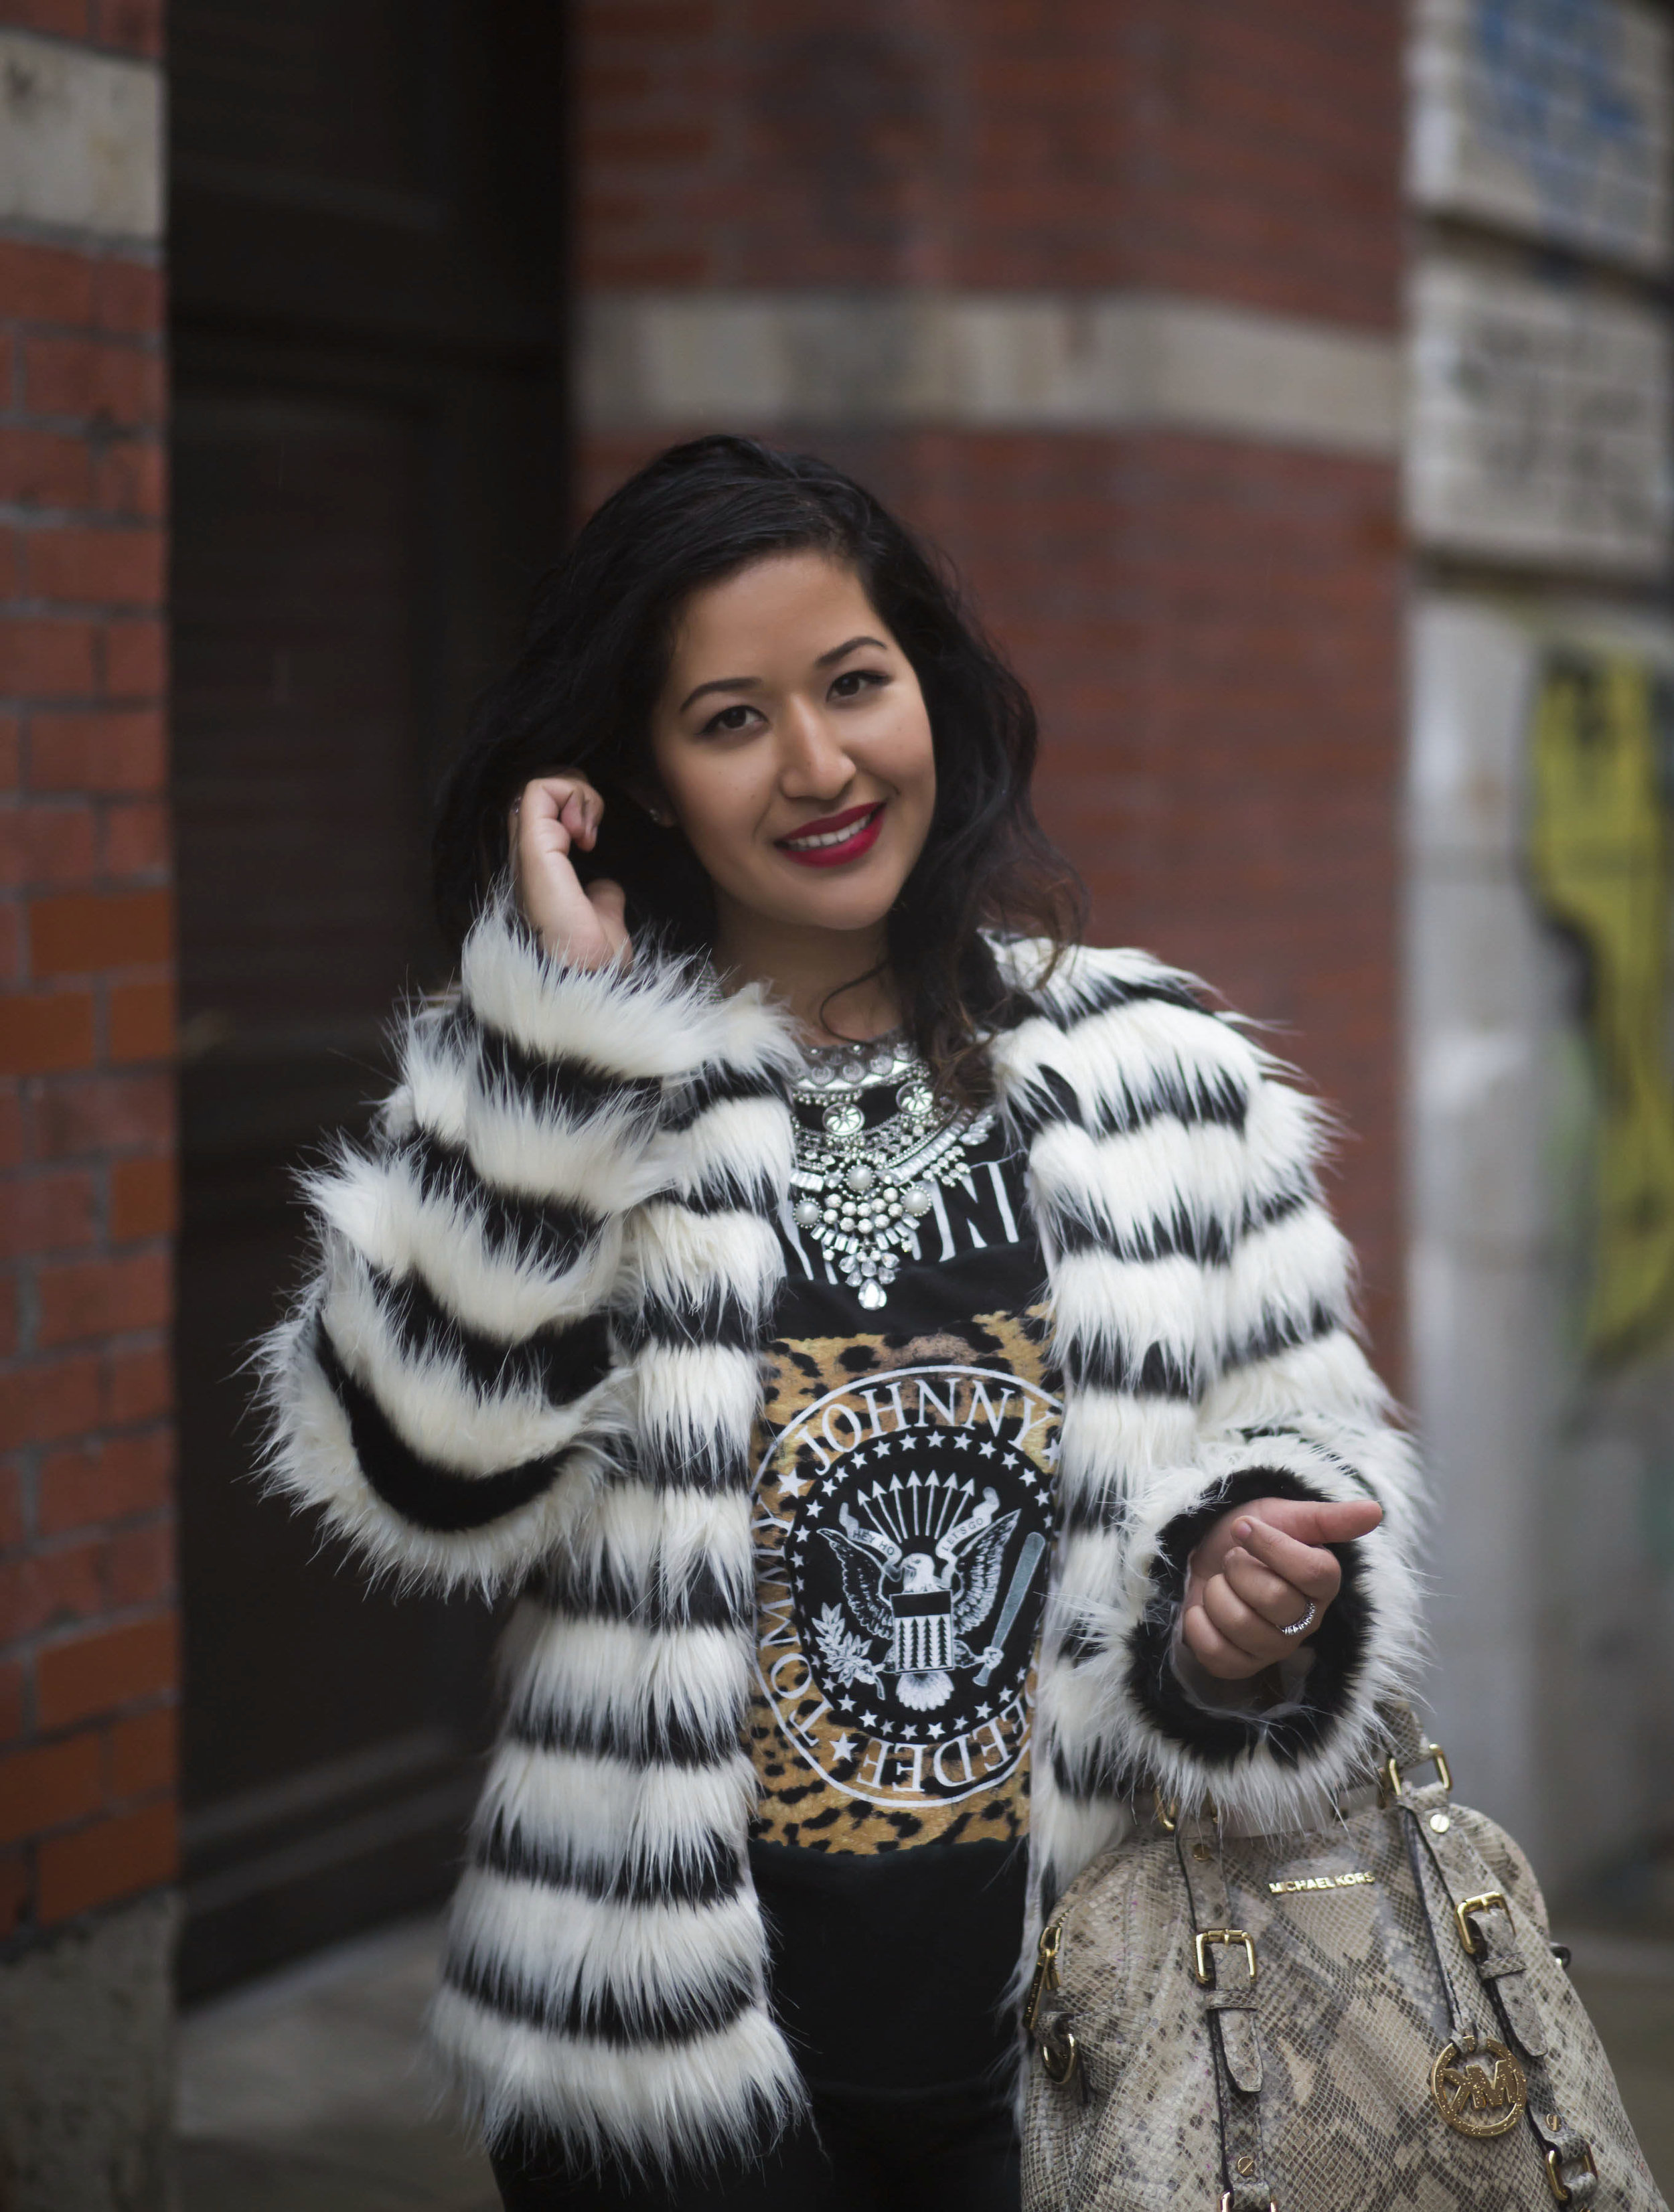 Black and WHite Make Me Chic Jacket x Krity S7.jpg